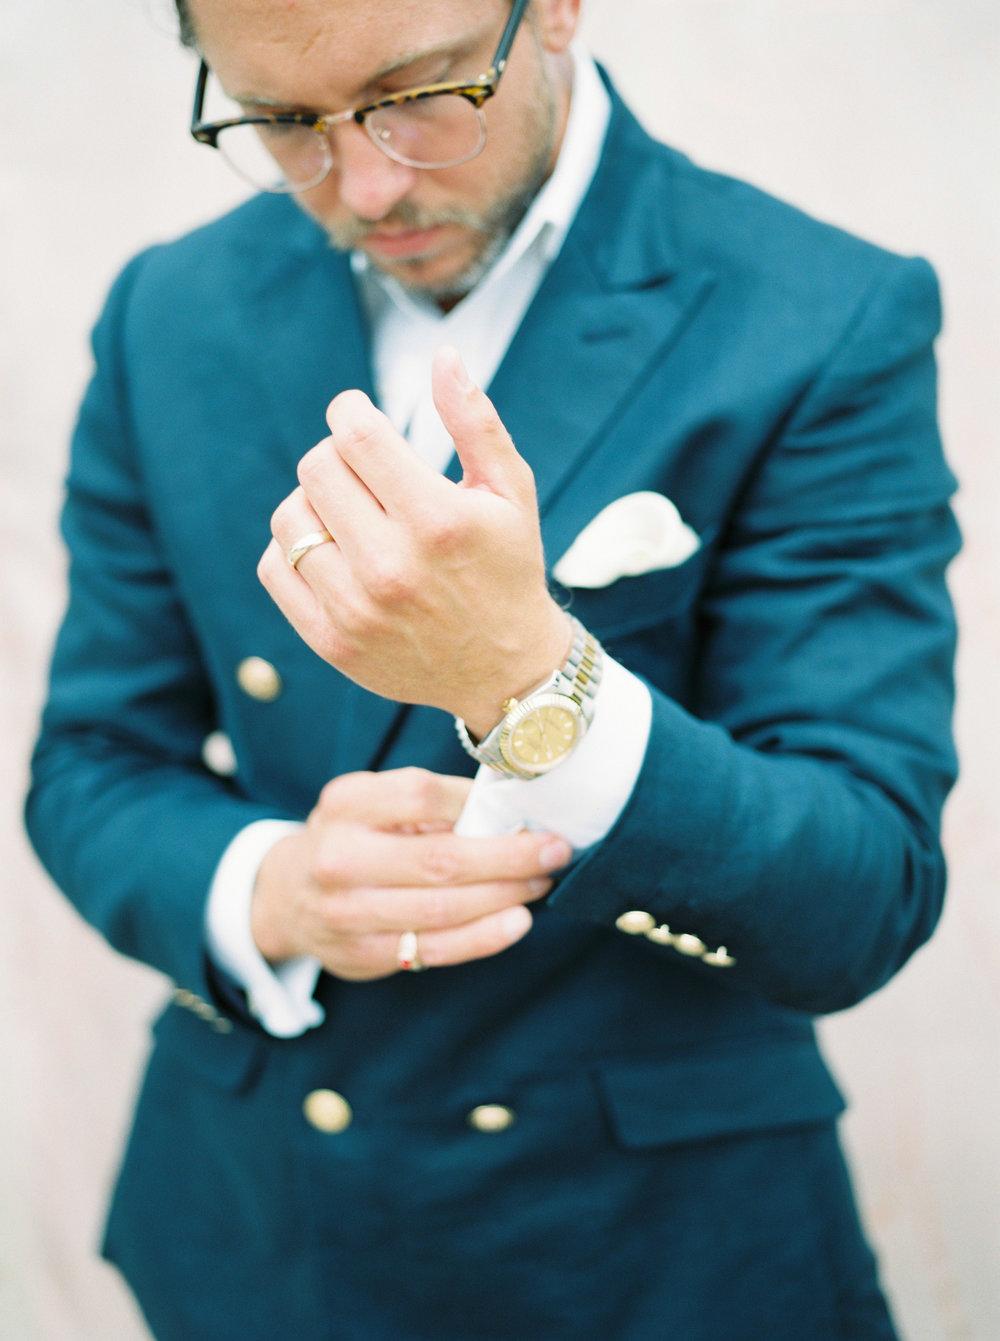 groom portraits by fine art wedding photographer imogen xiana in oxford